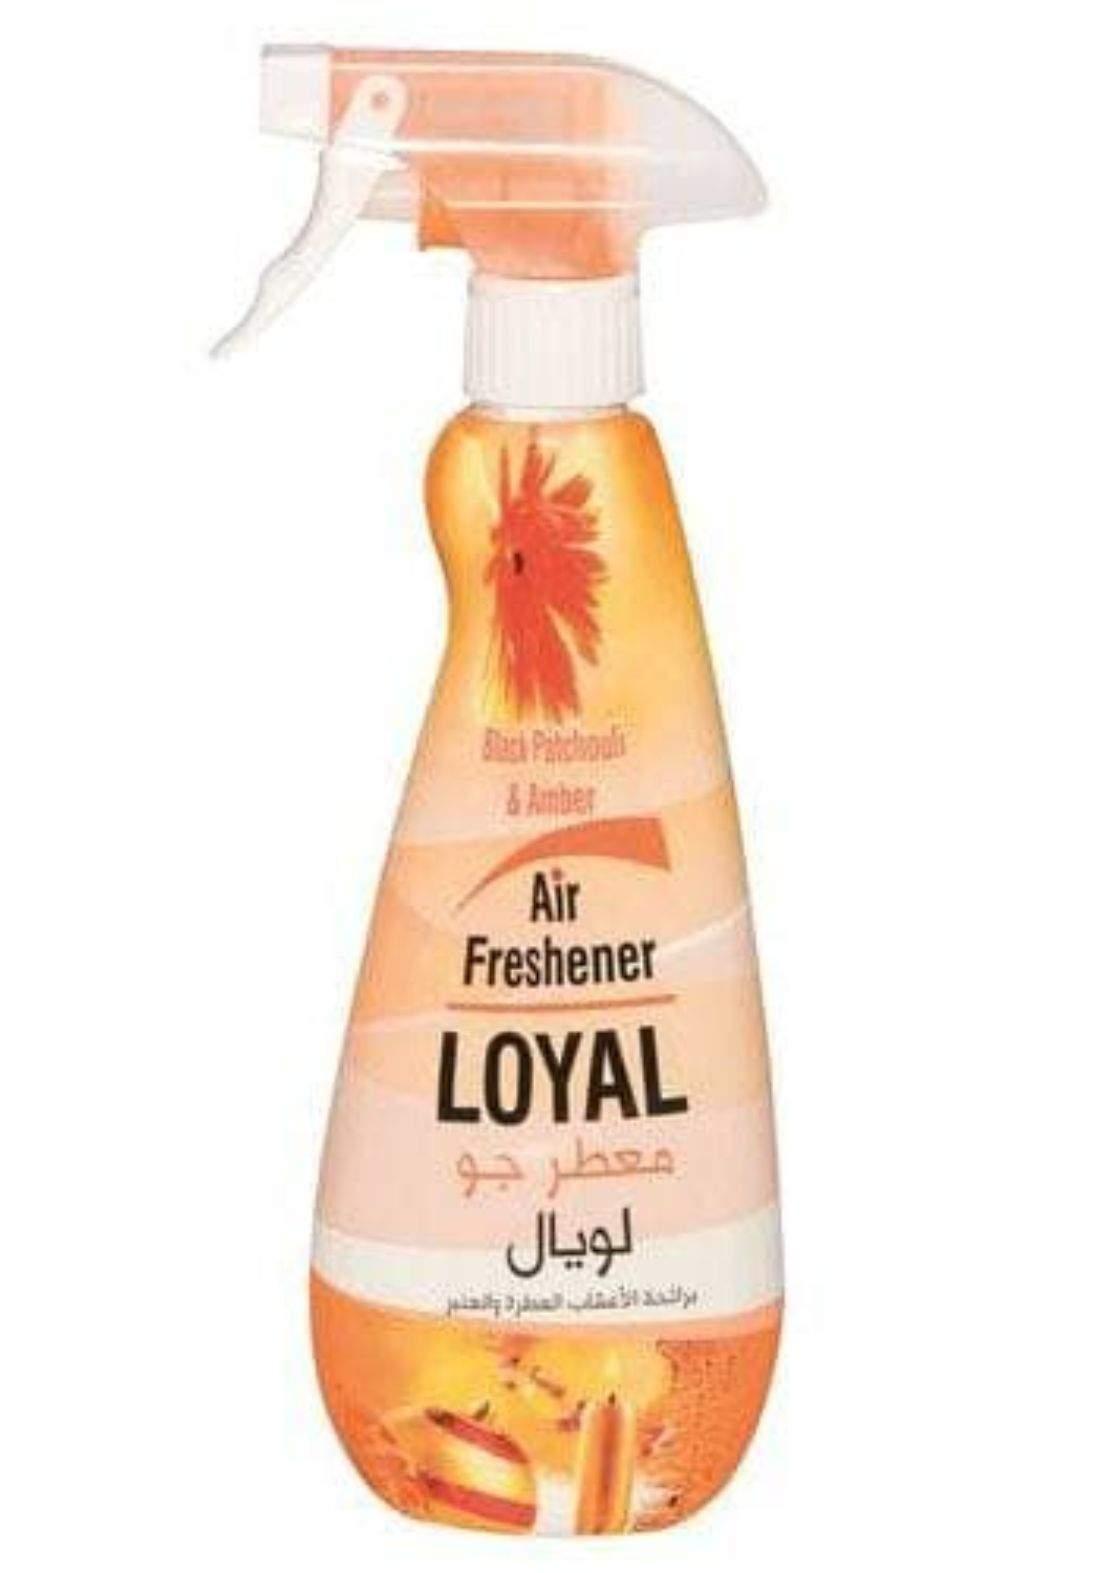 Loyal multi purpose freshener 450ml لويال معطر بخاخ متعدد الاستعمالات